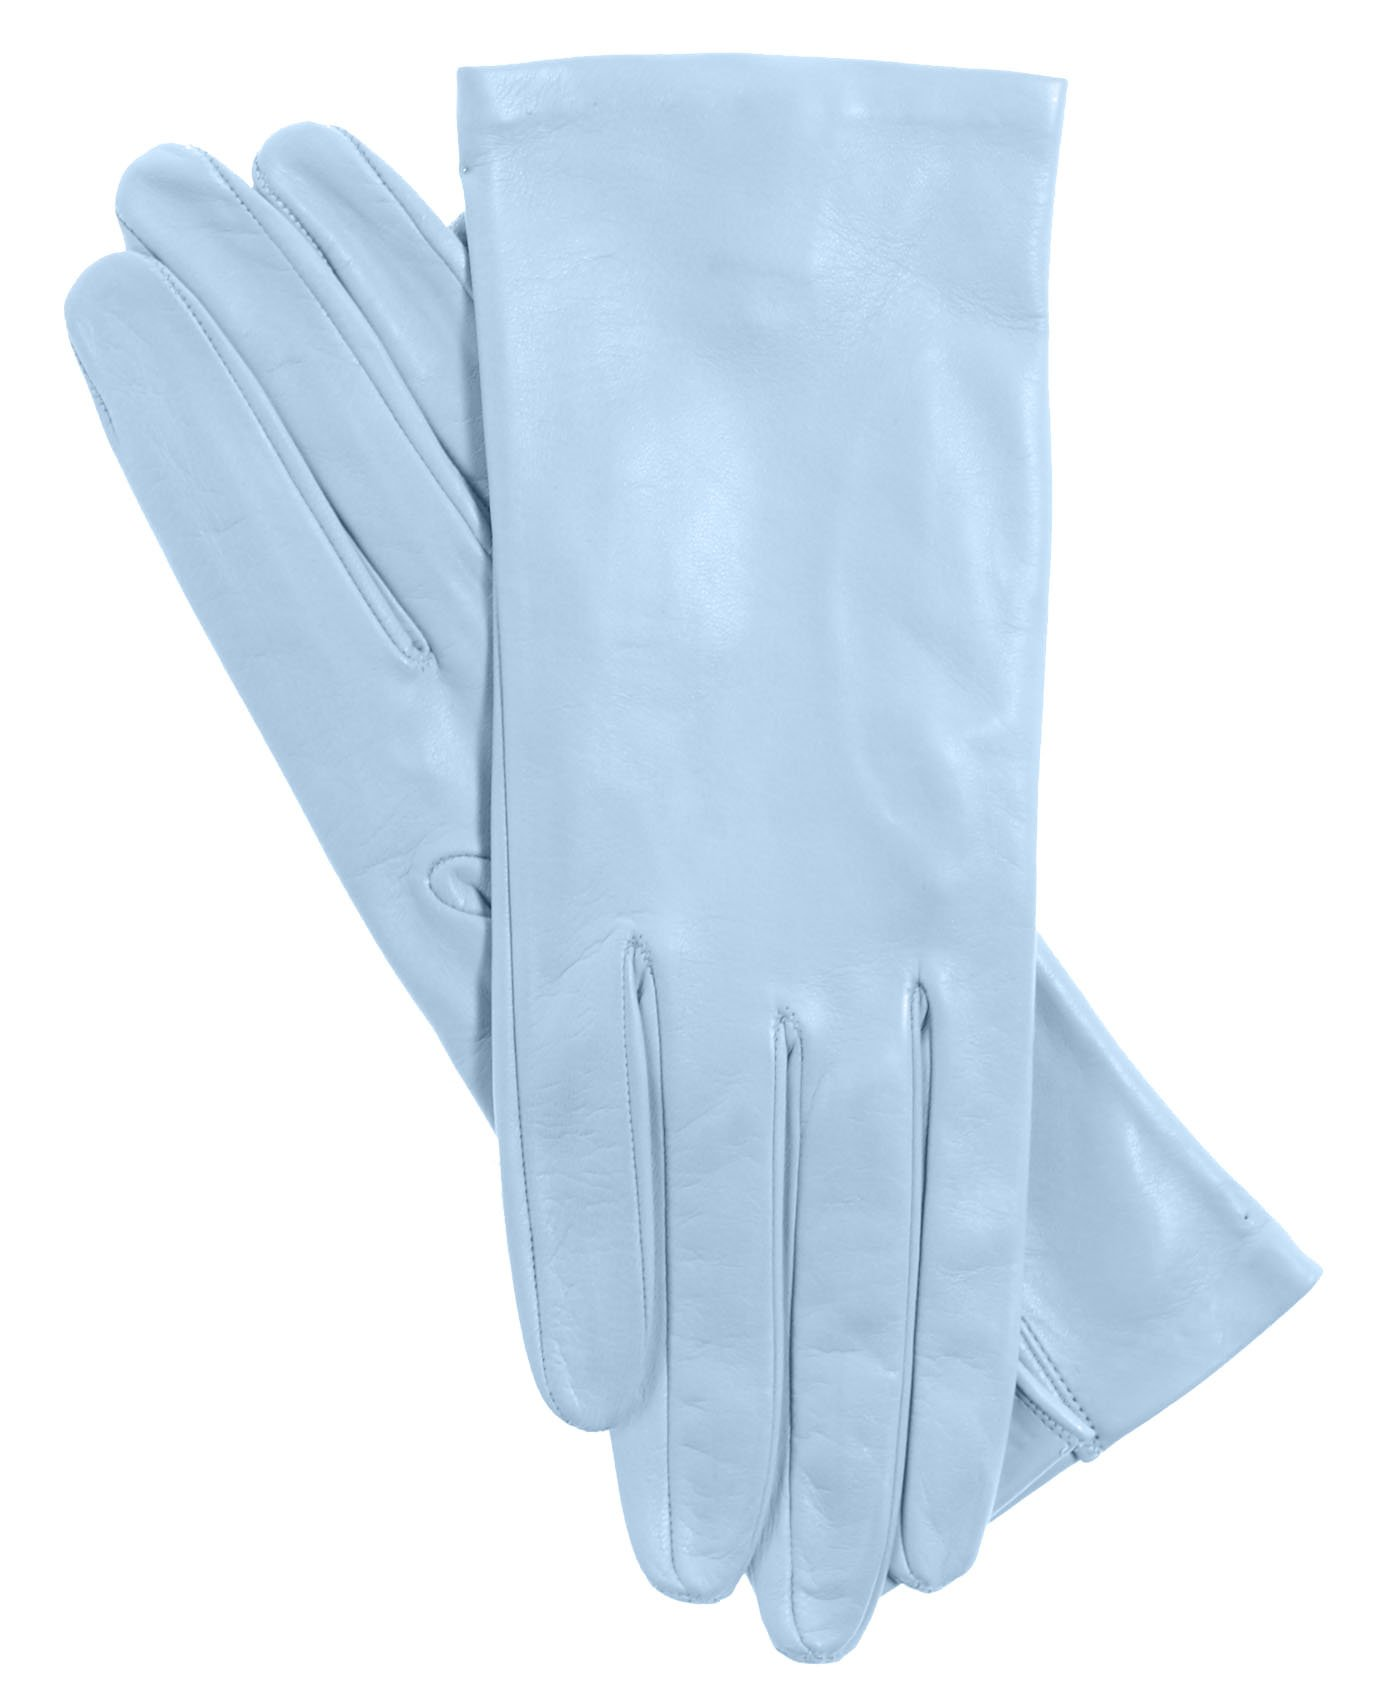 Fratelli Orsini Women's Italian Silk Lined Leather Gloves Size 6 1/2 Color 41-Celeste